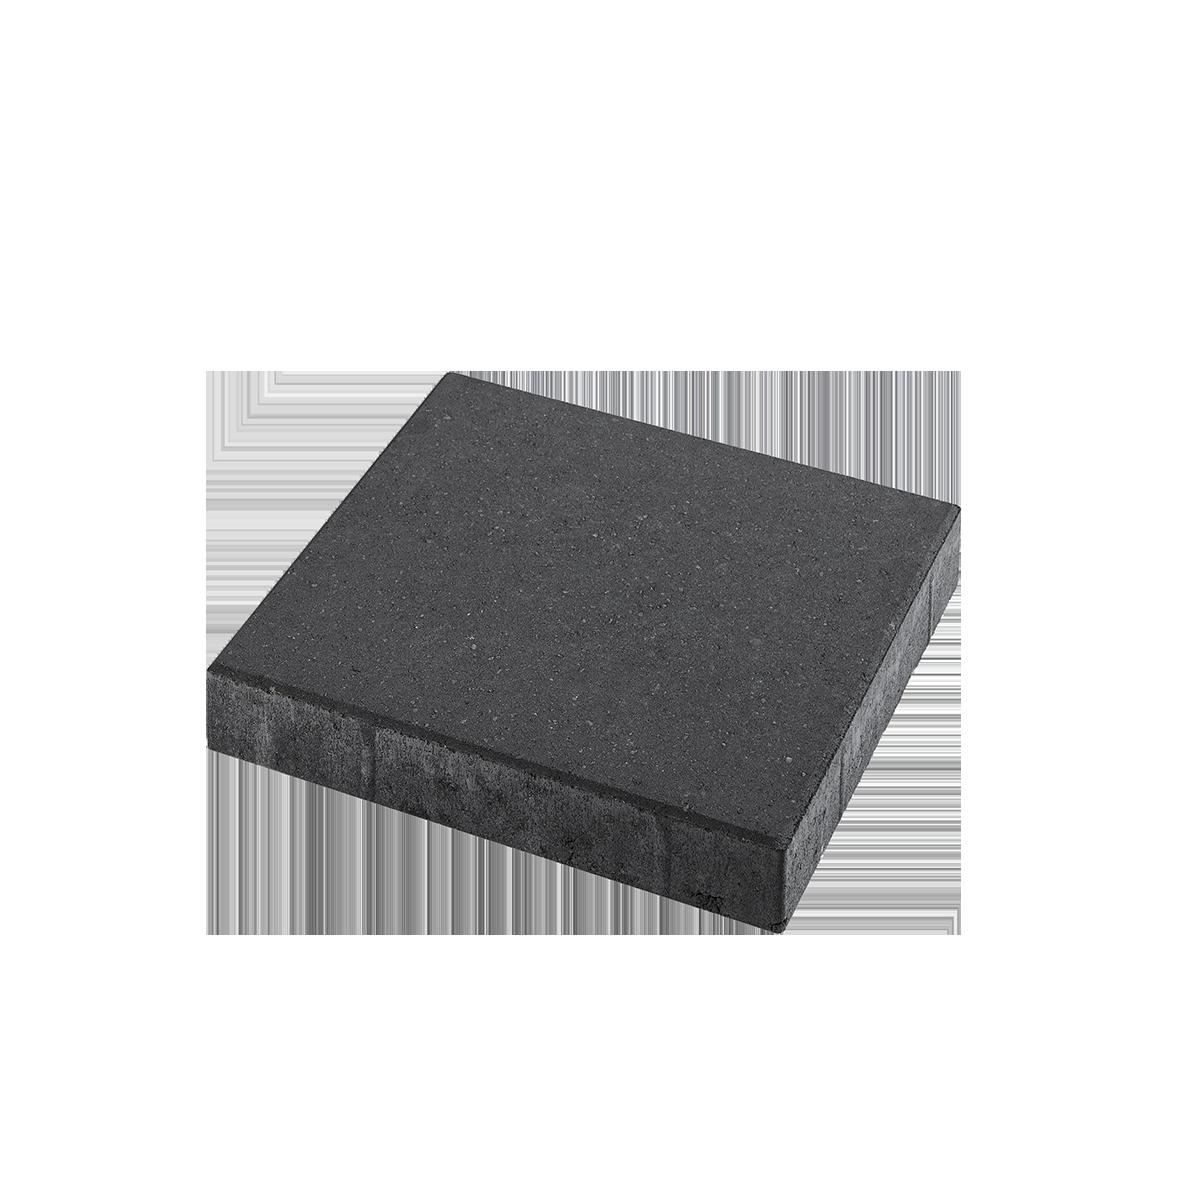 Fliser 40x40x5 cm Sort/Antracit